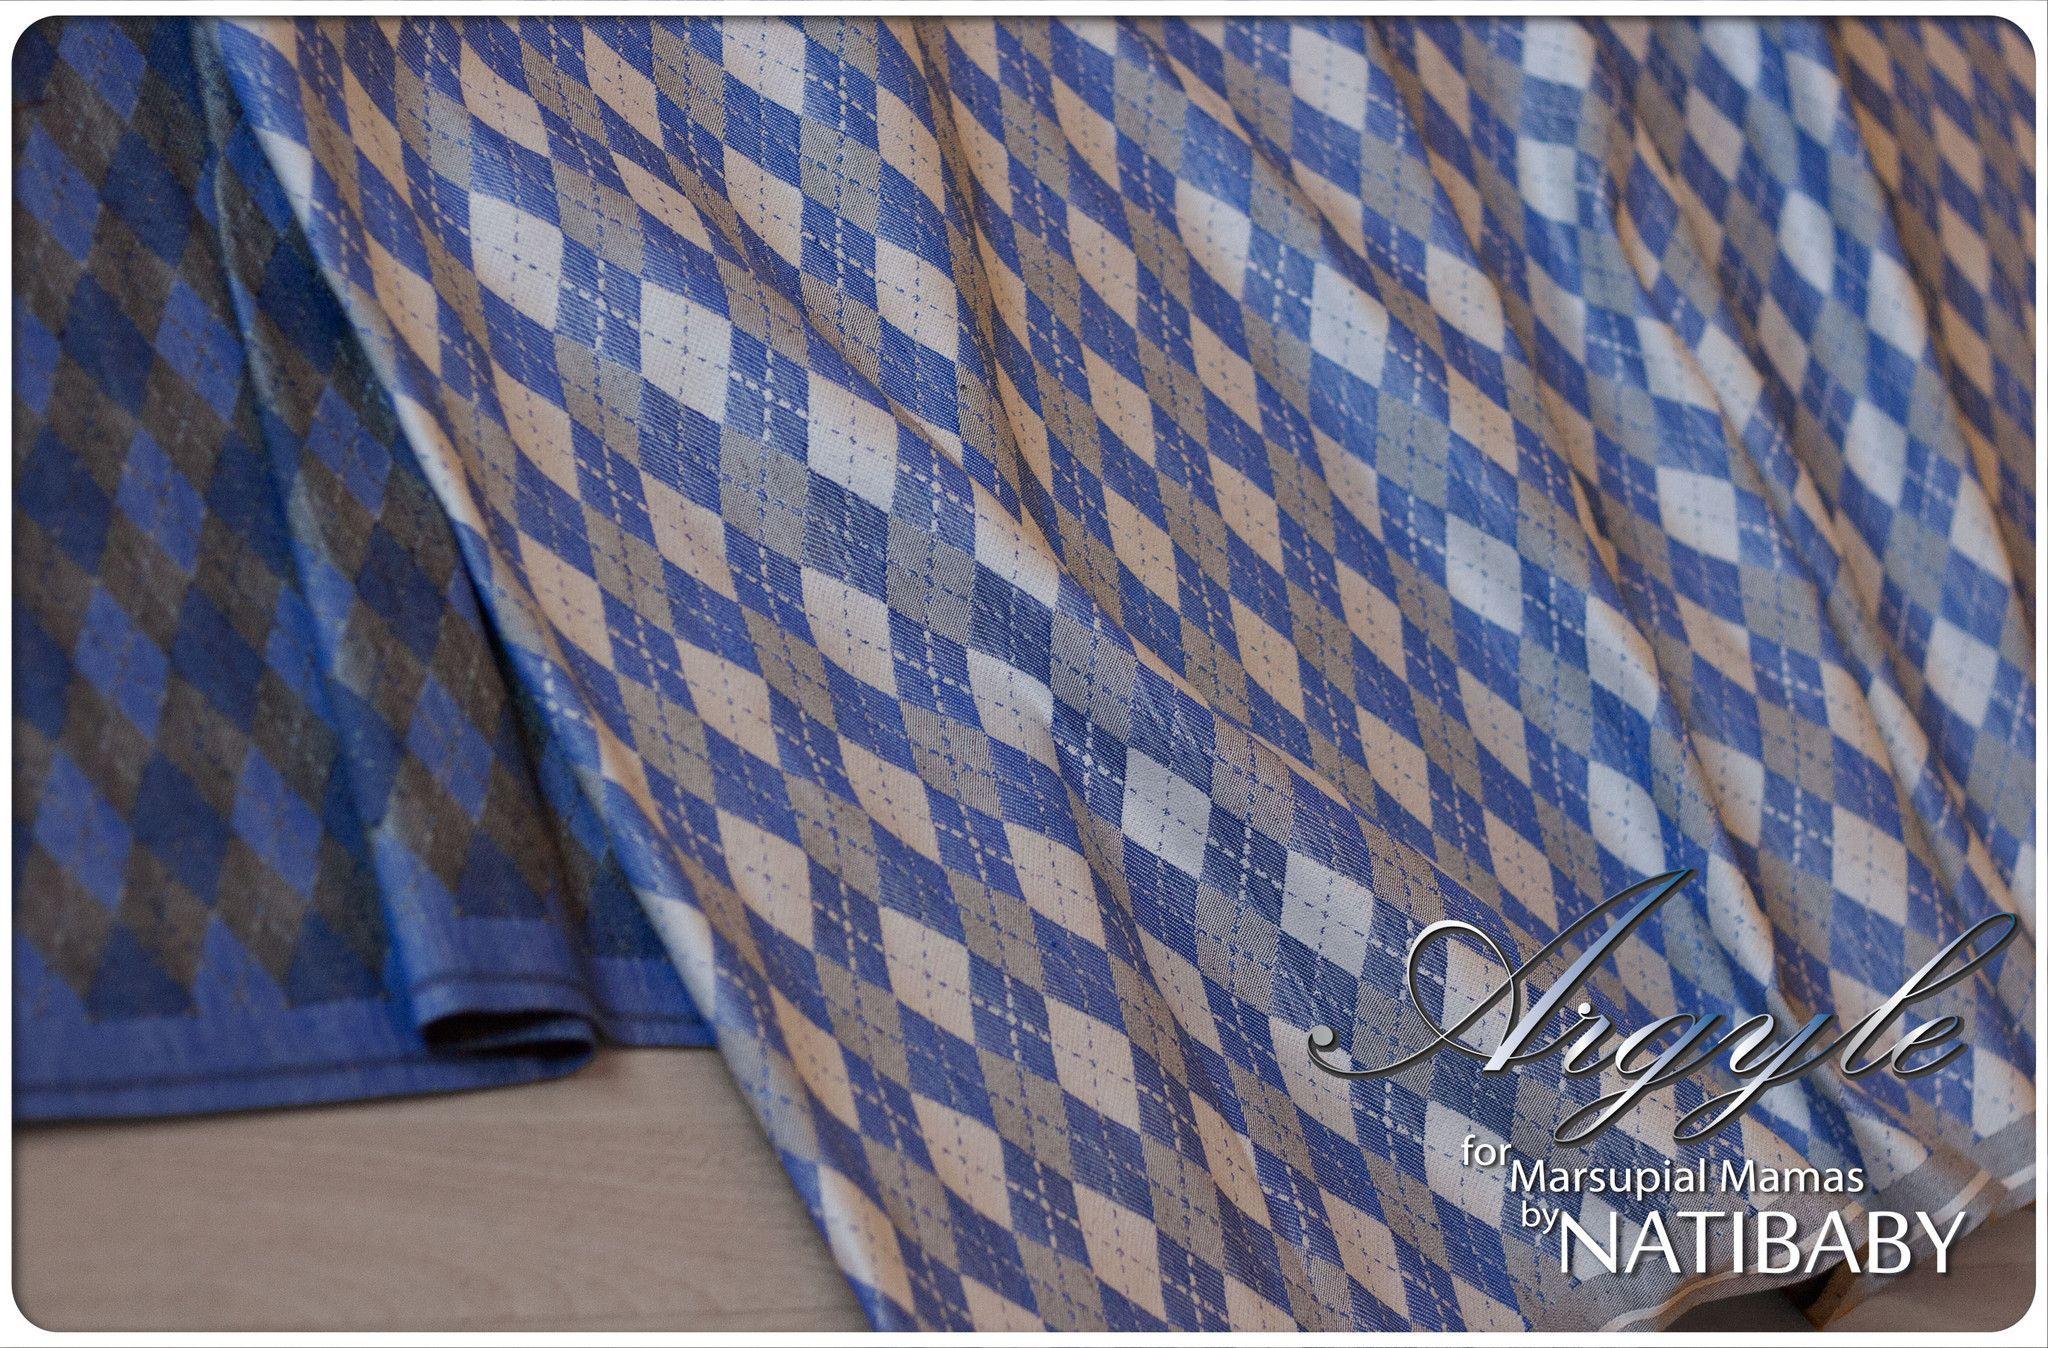 Marsupial Mamas Exclusive: Natibaby Argyle Blue (Hemp Blend) - Marsupial Mamas, LLC